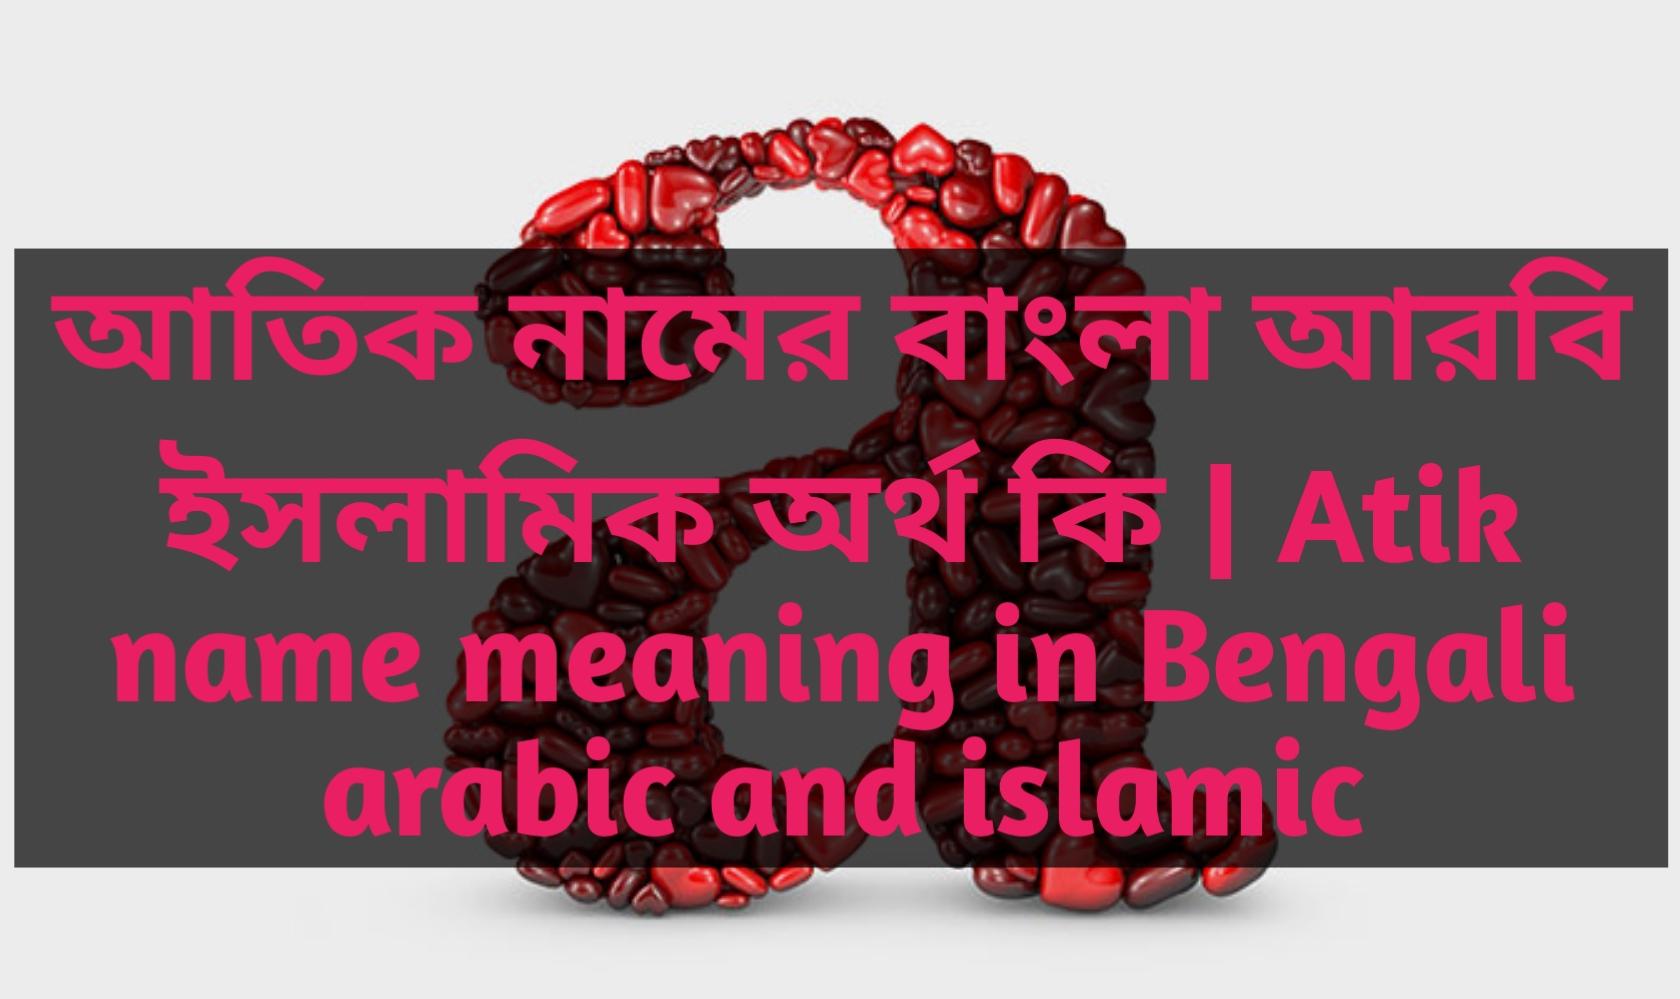 atik name meaning in Bengali, আতিক নামের অর্থ কি, আতিক নামের বাংলা অর্থ কি, আতিক নামের ইসলামিক অর্থ কি,